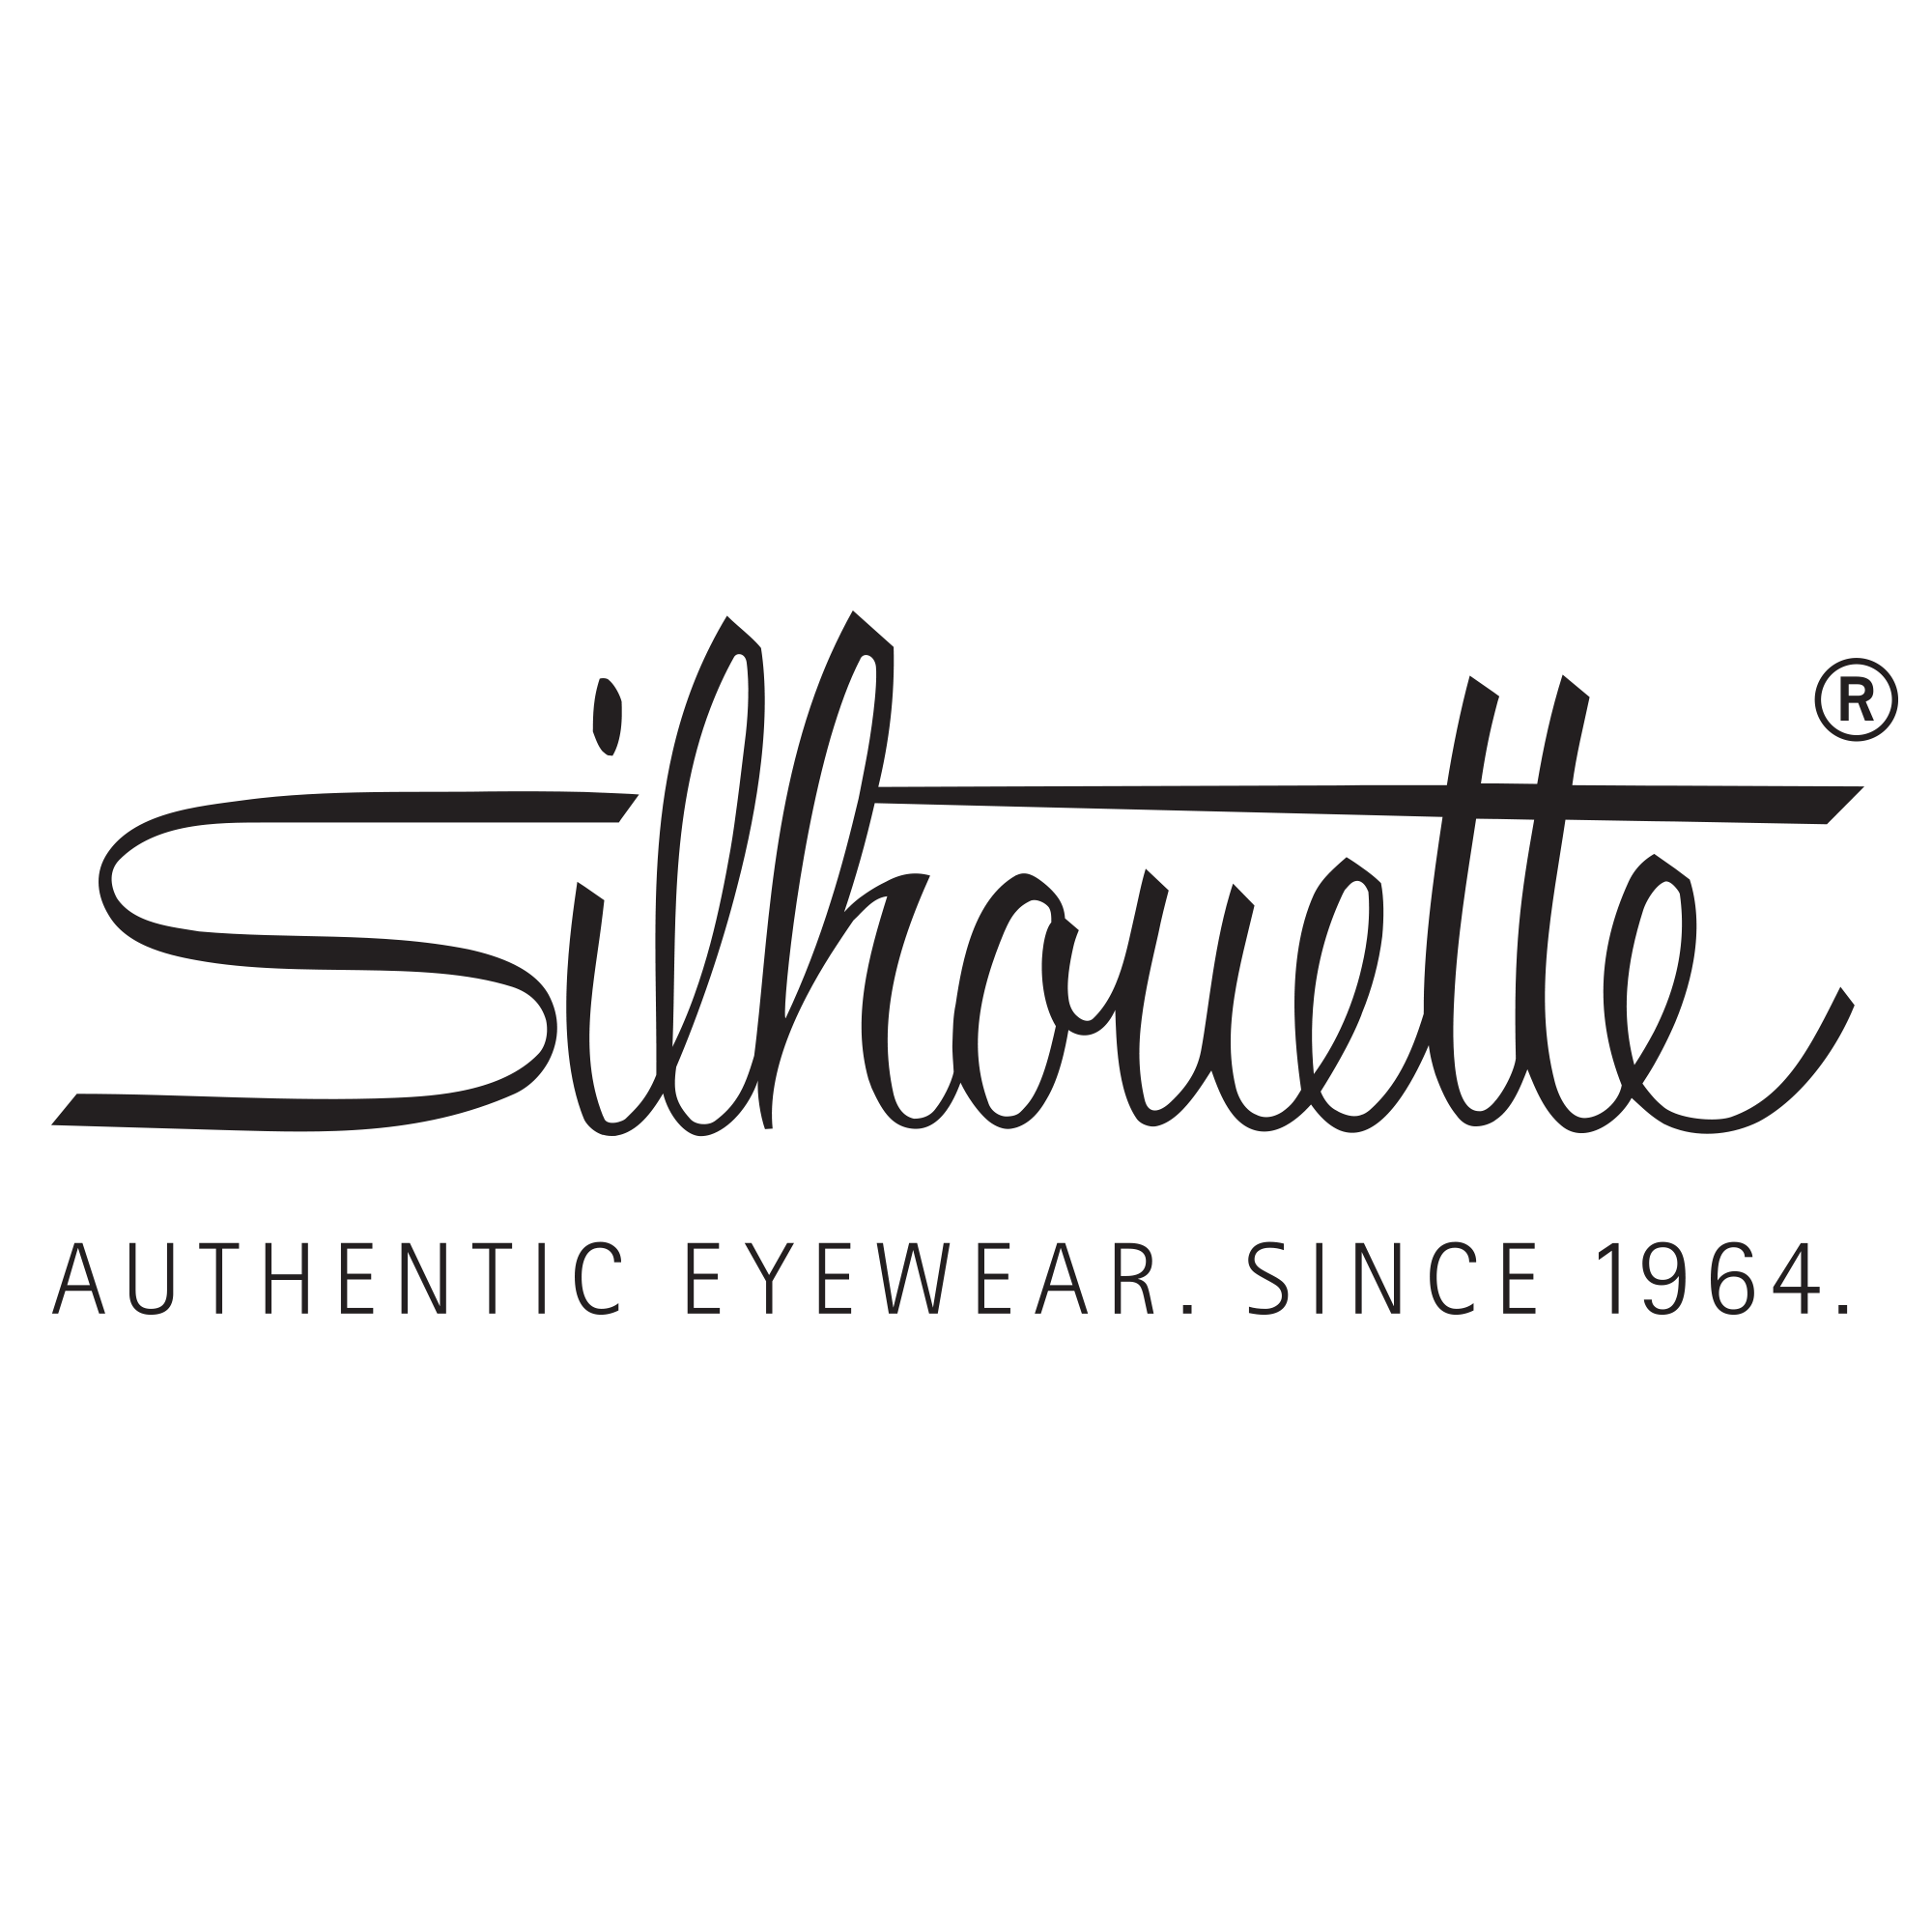 Silhouette-Logo-Black-transparent-background.png